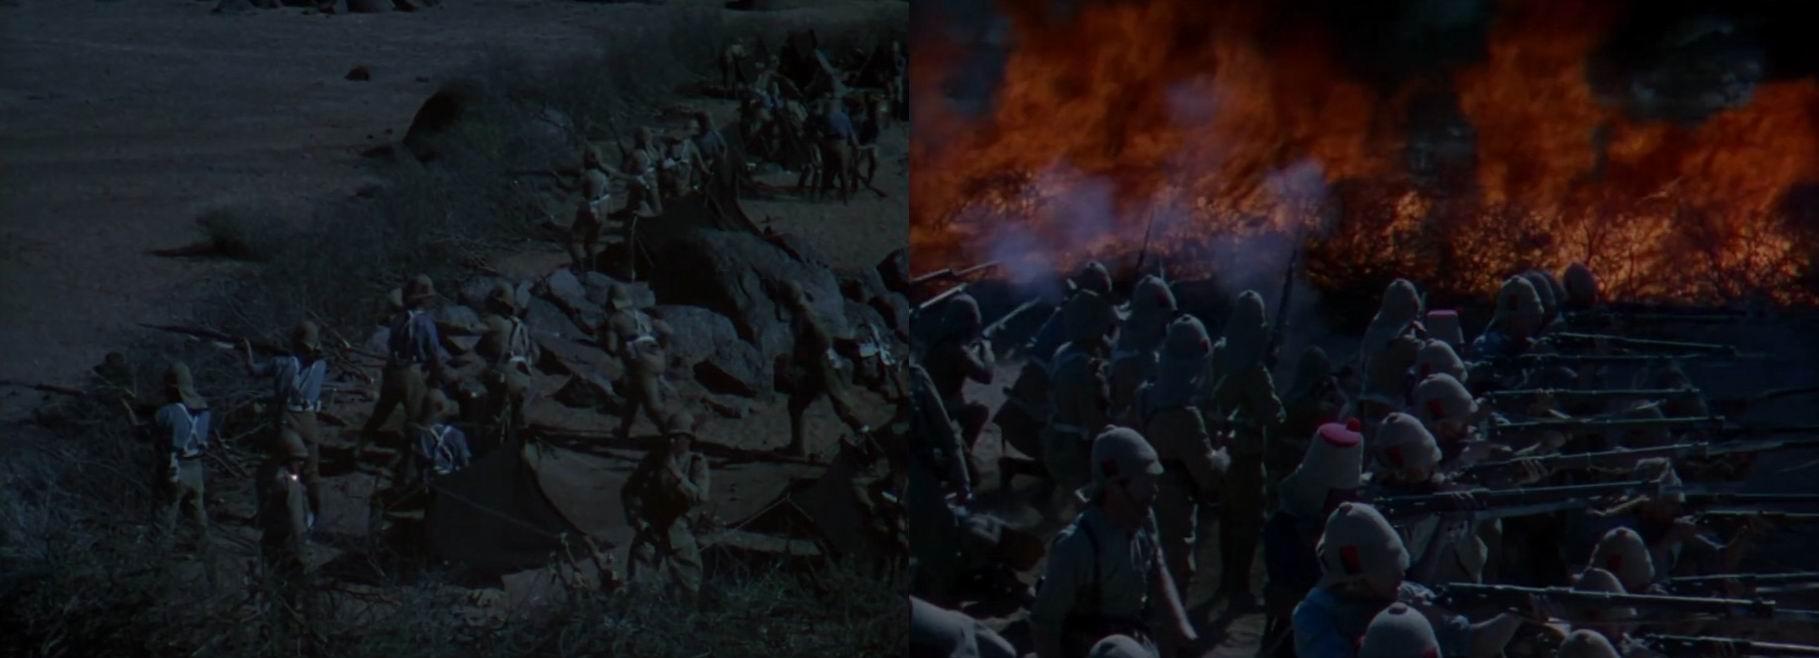 У солдат ранние Ли-Энфилды, внешне похожие на Ли-Метфорды, да и по датам все равно подходят.